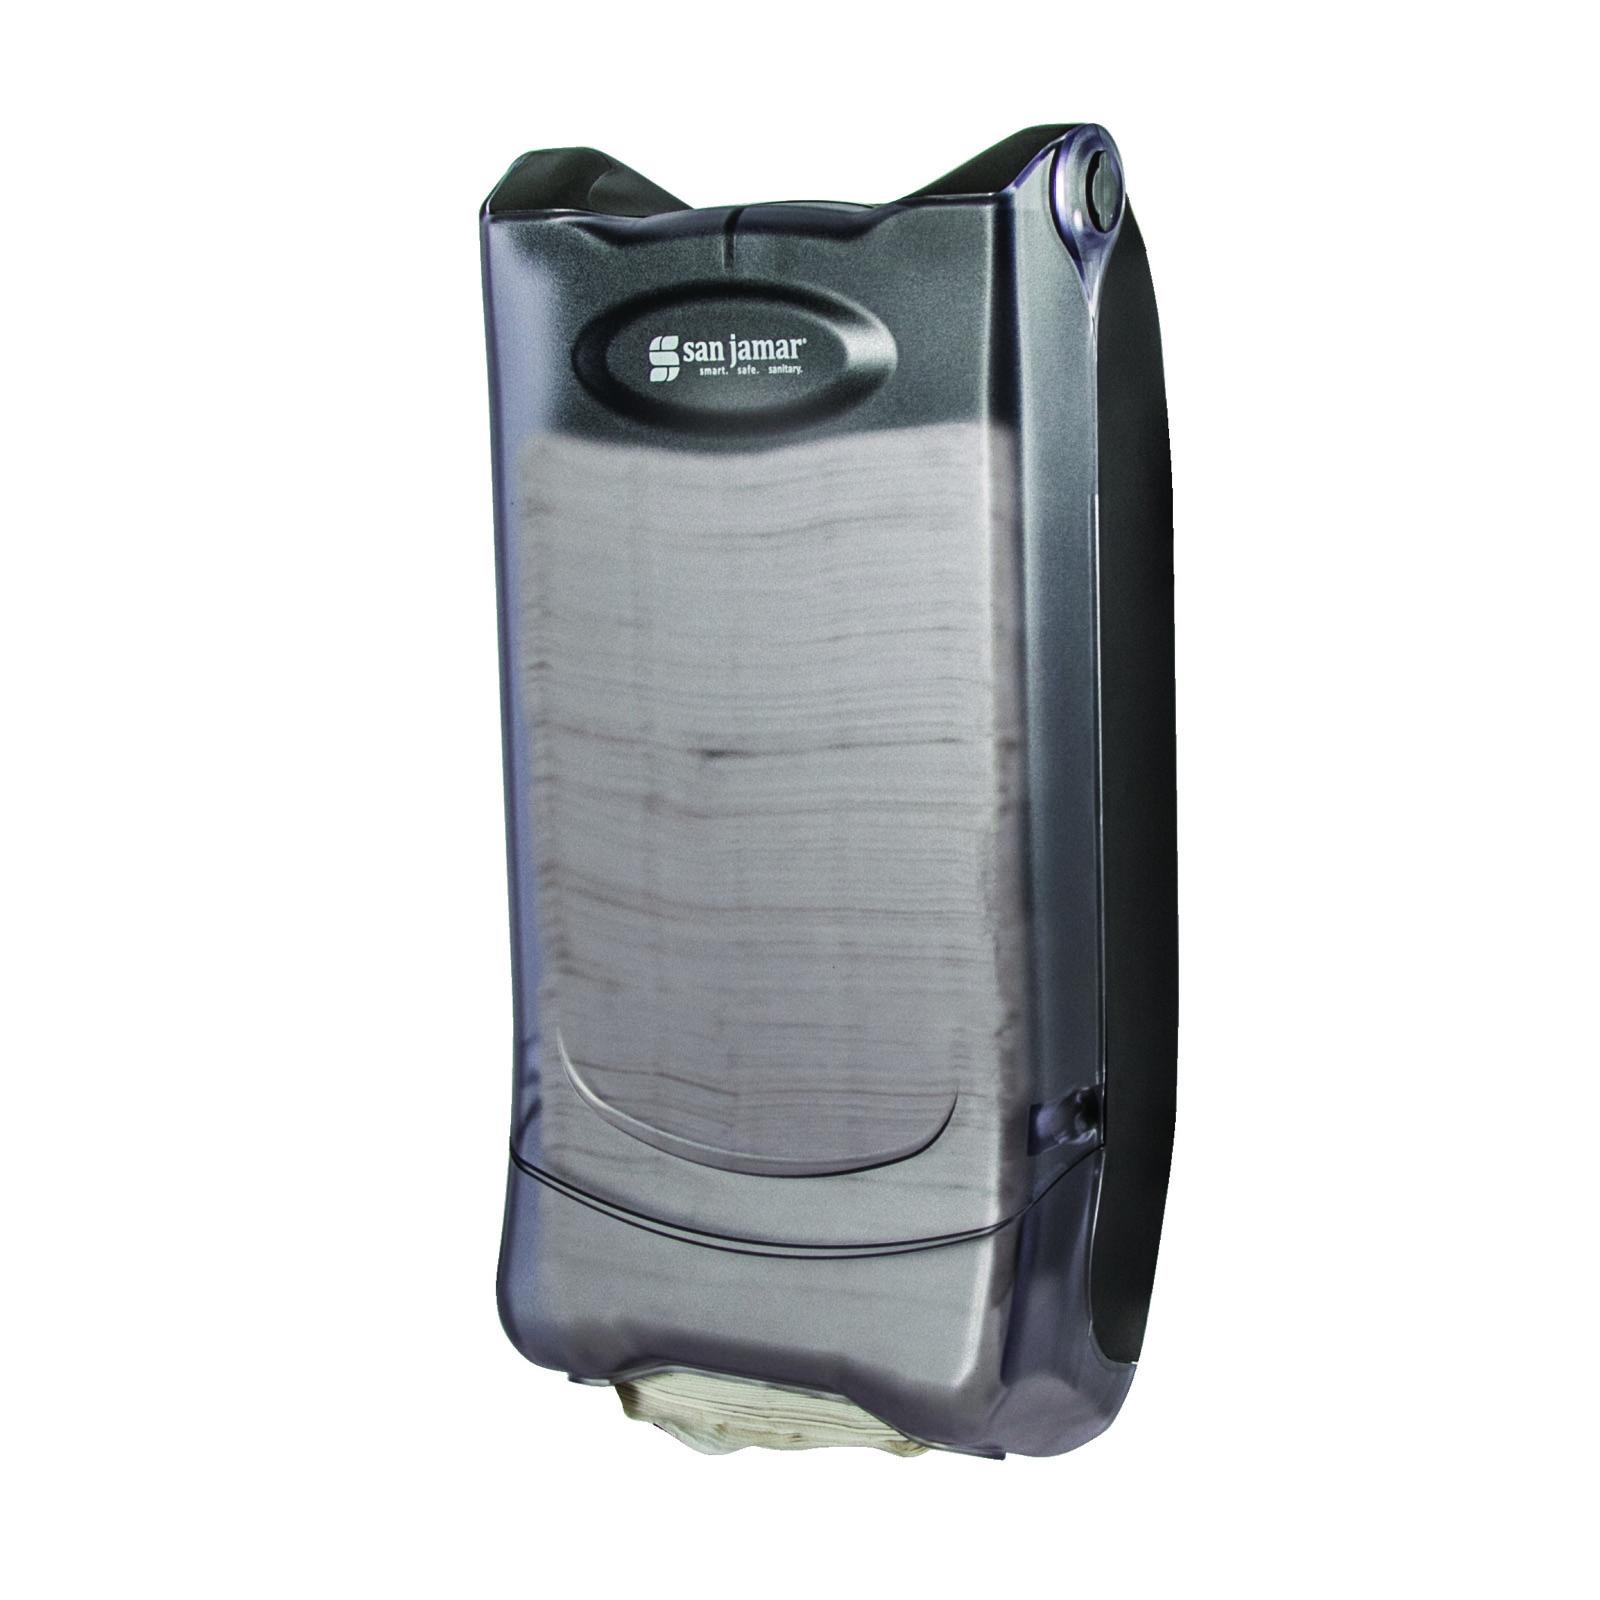 San Jamar H5000PCL paper napkin dispenser